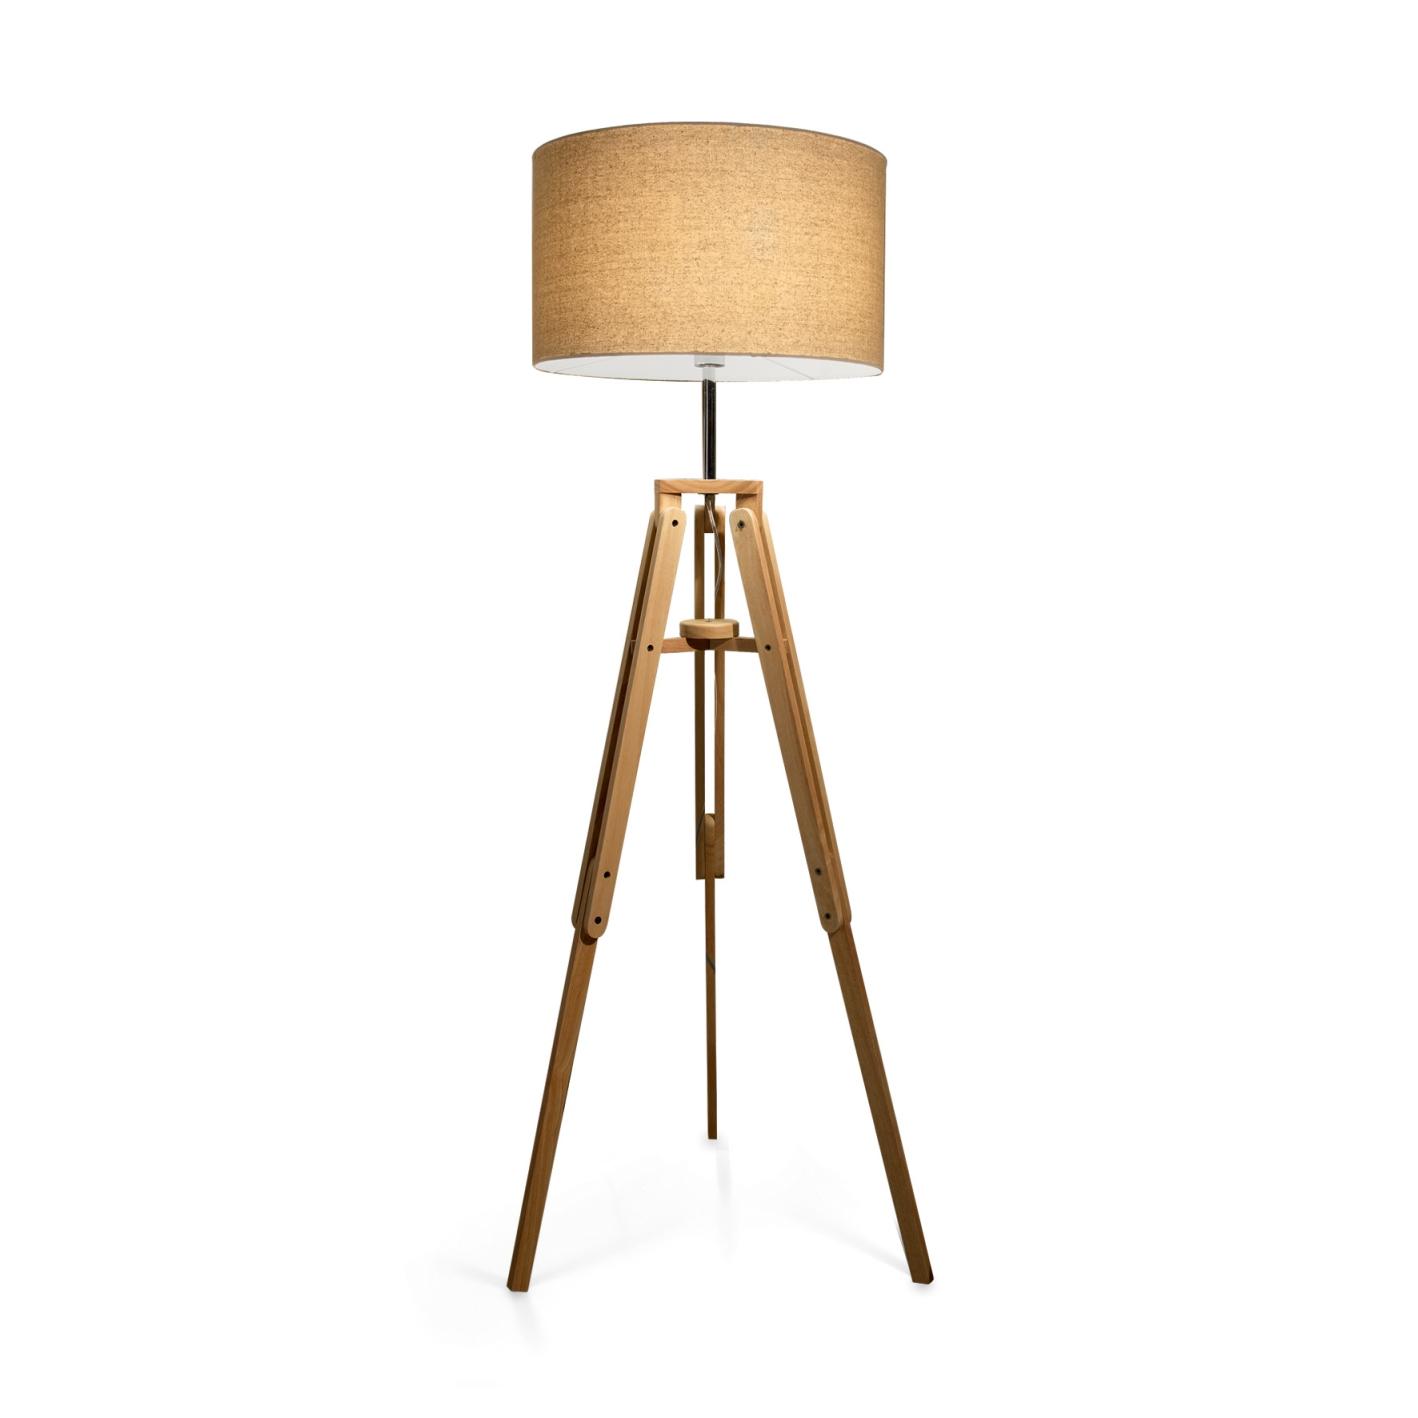 Groovy Livarno Lux Lampa At Cx56 Getclopa